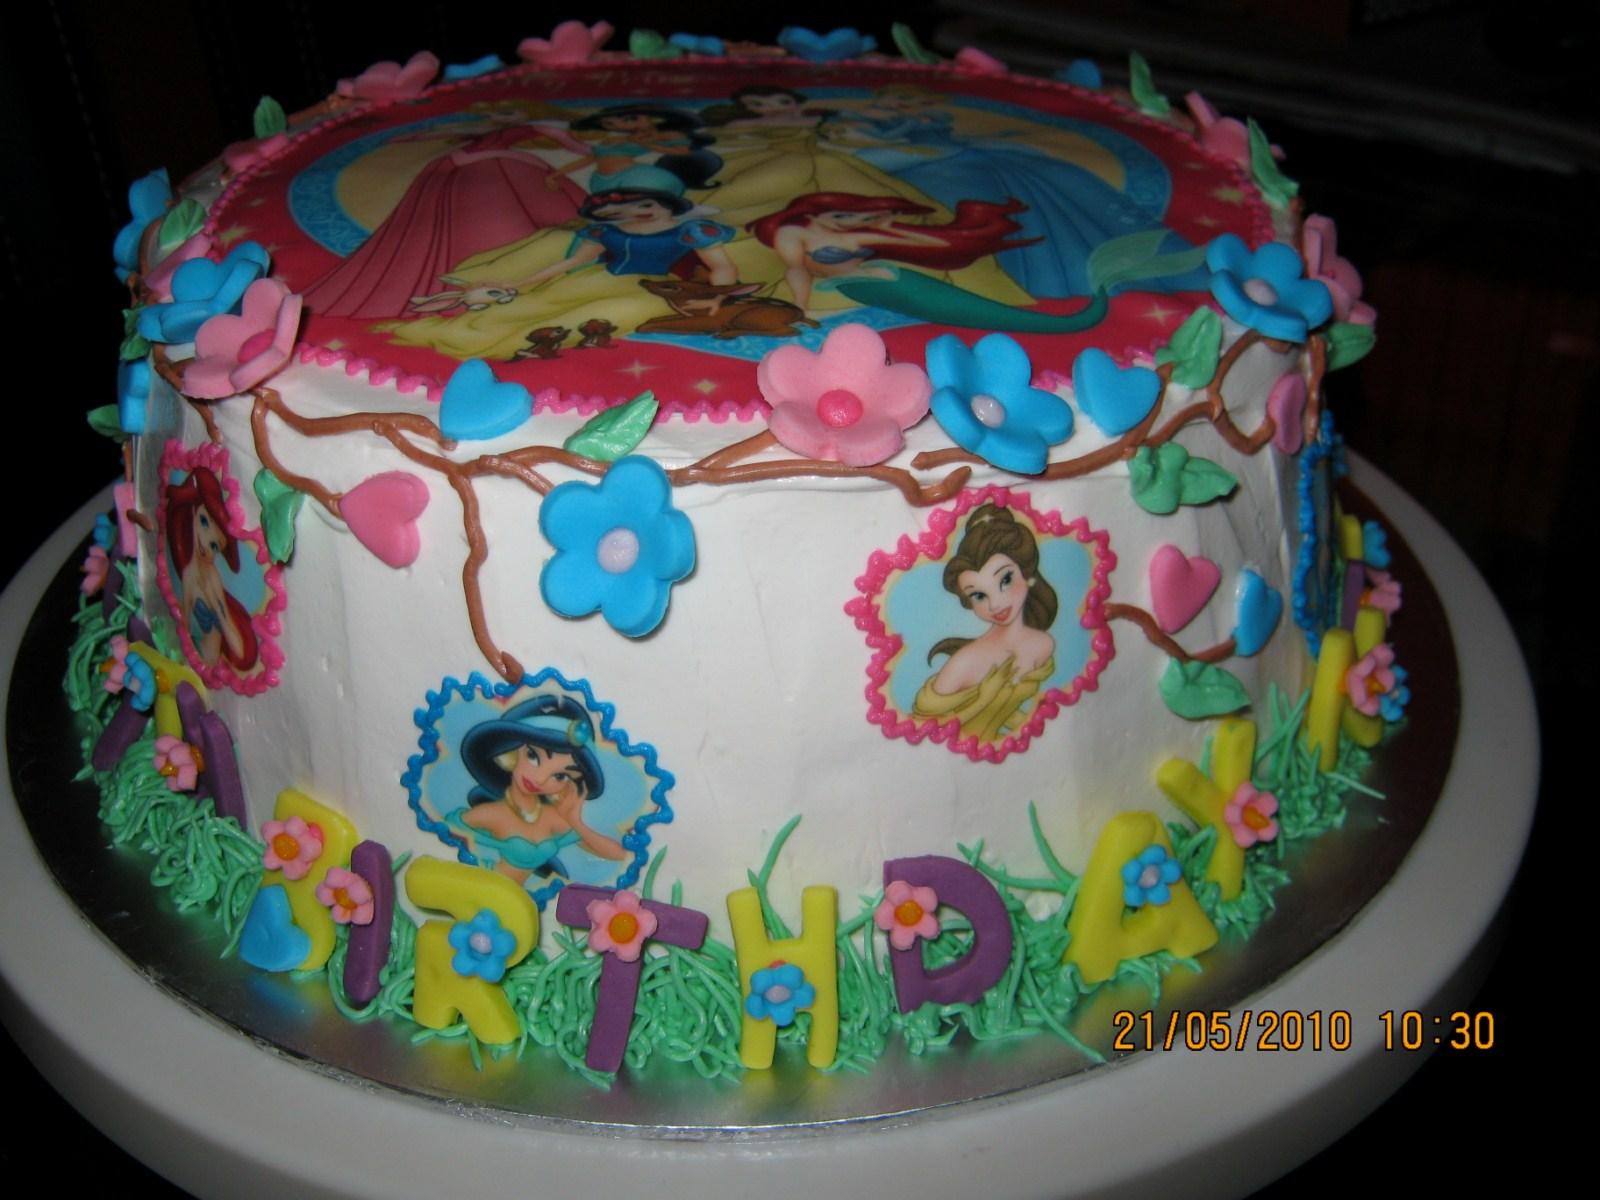 Birthday Cake Edible Pictures : Sweet Bake: Birthday Cake - Princess Edible Image